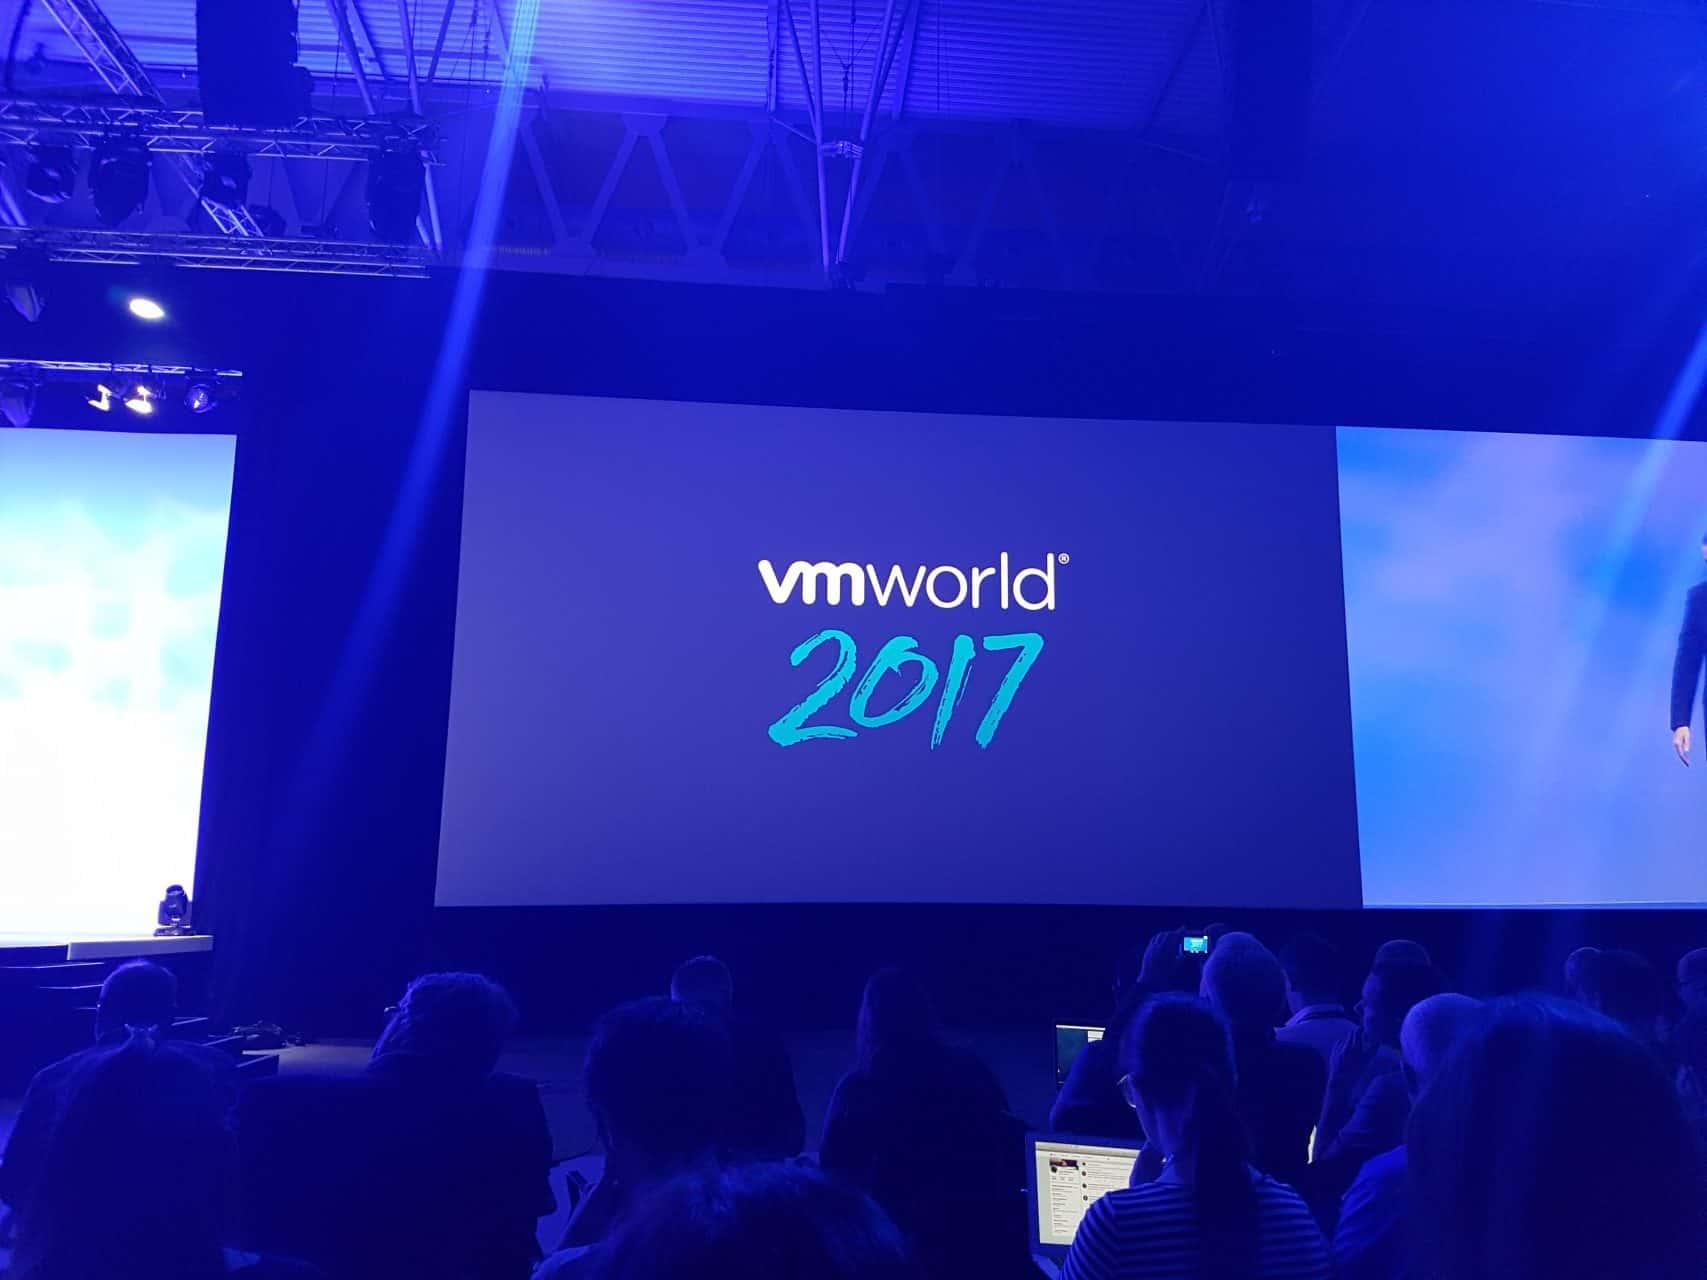 De samenvatting van VMworld 2017 Barcelona